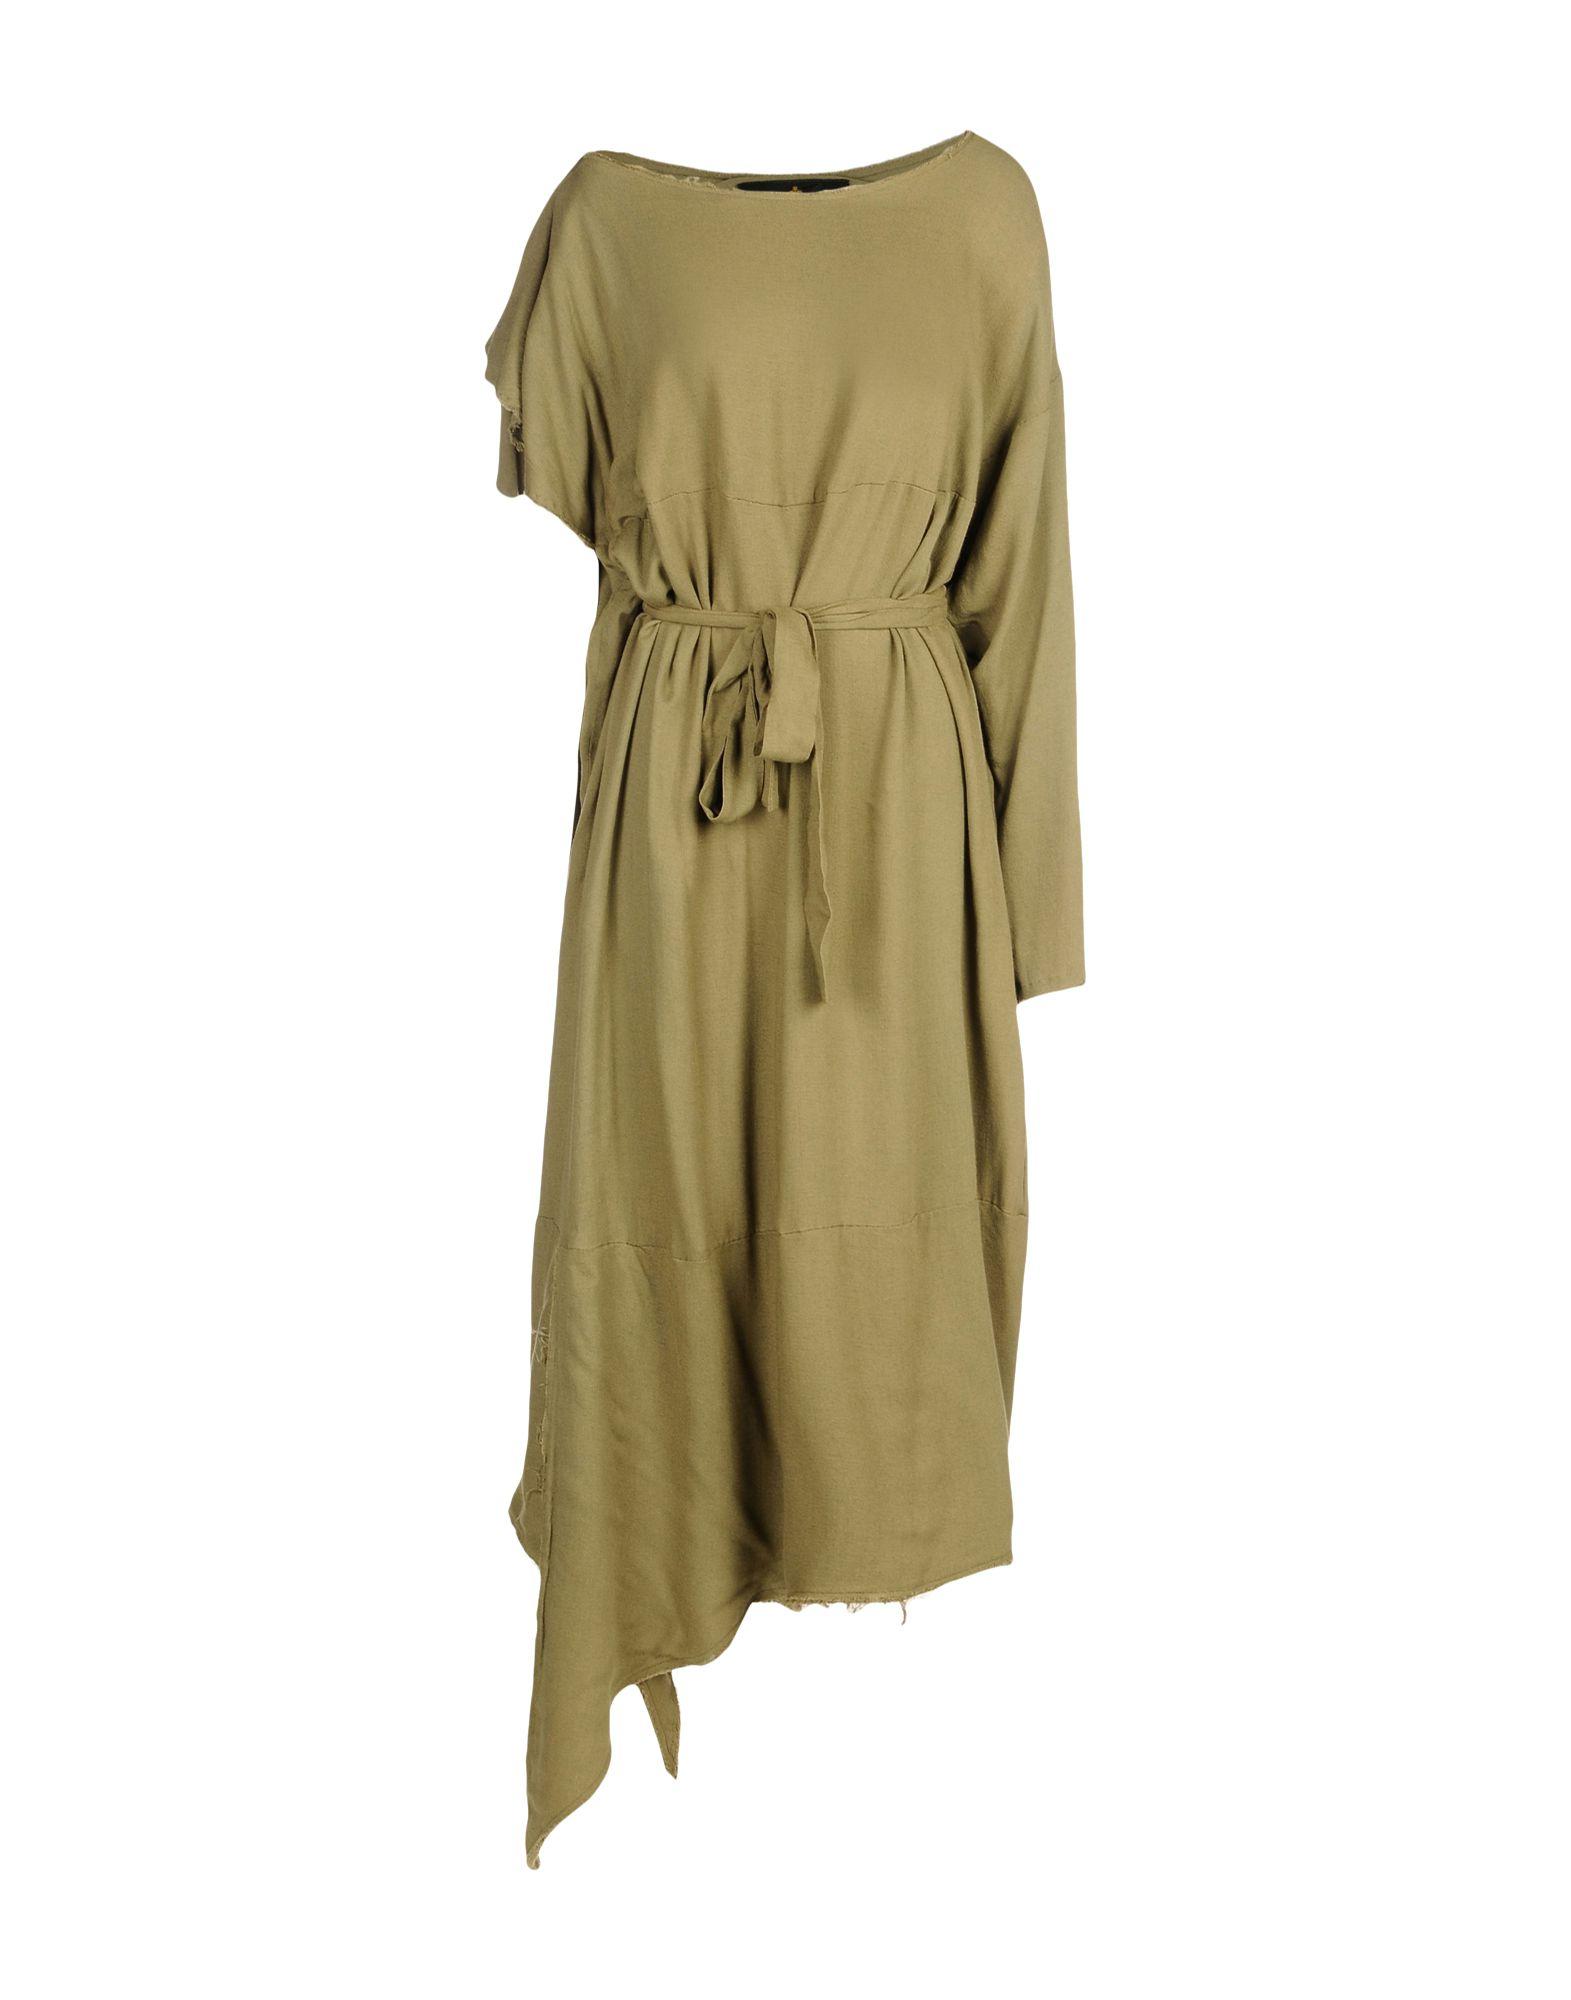 VIVIENNE WESTWOOD ANGLOMANIA Платье длиной 3/4 vivienne westwood платье длиной 3 4